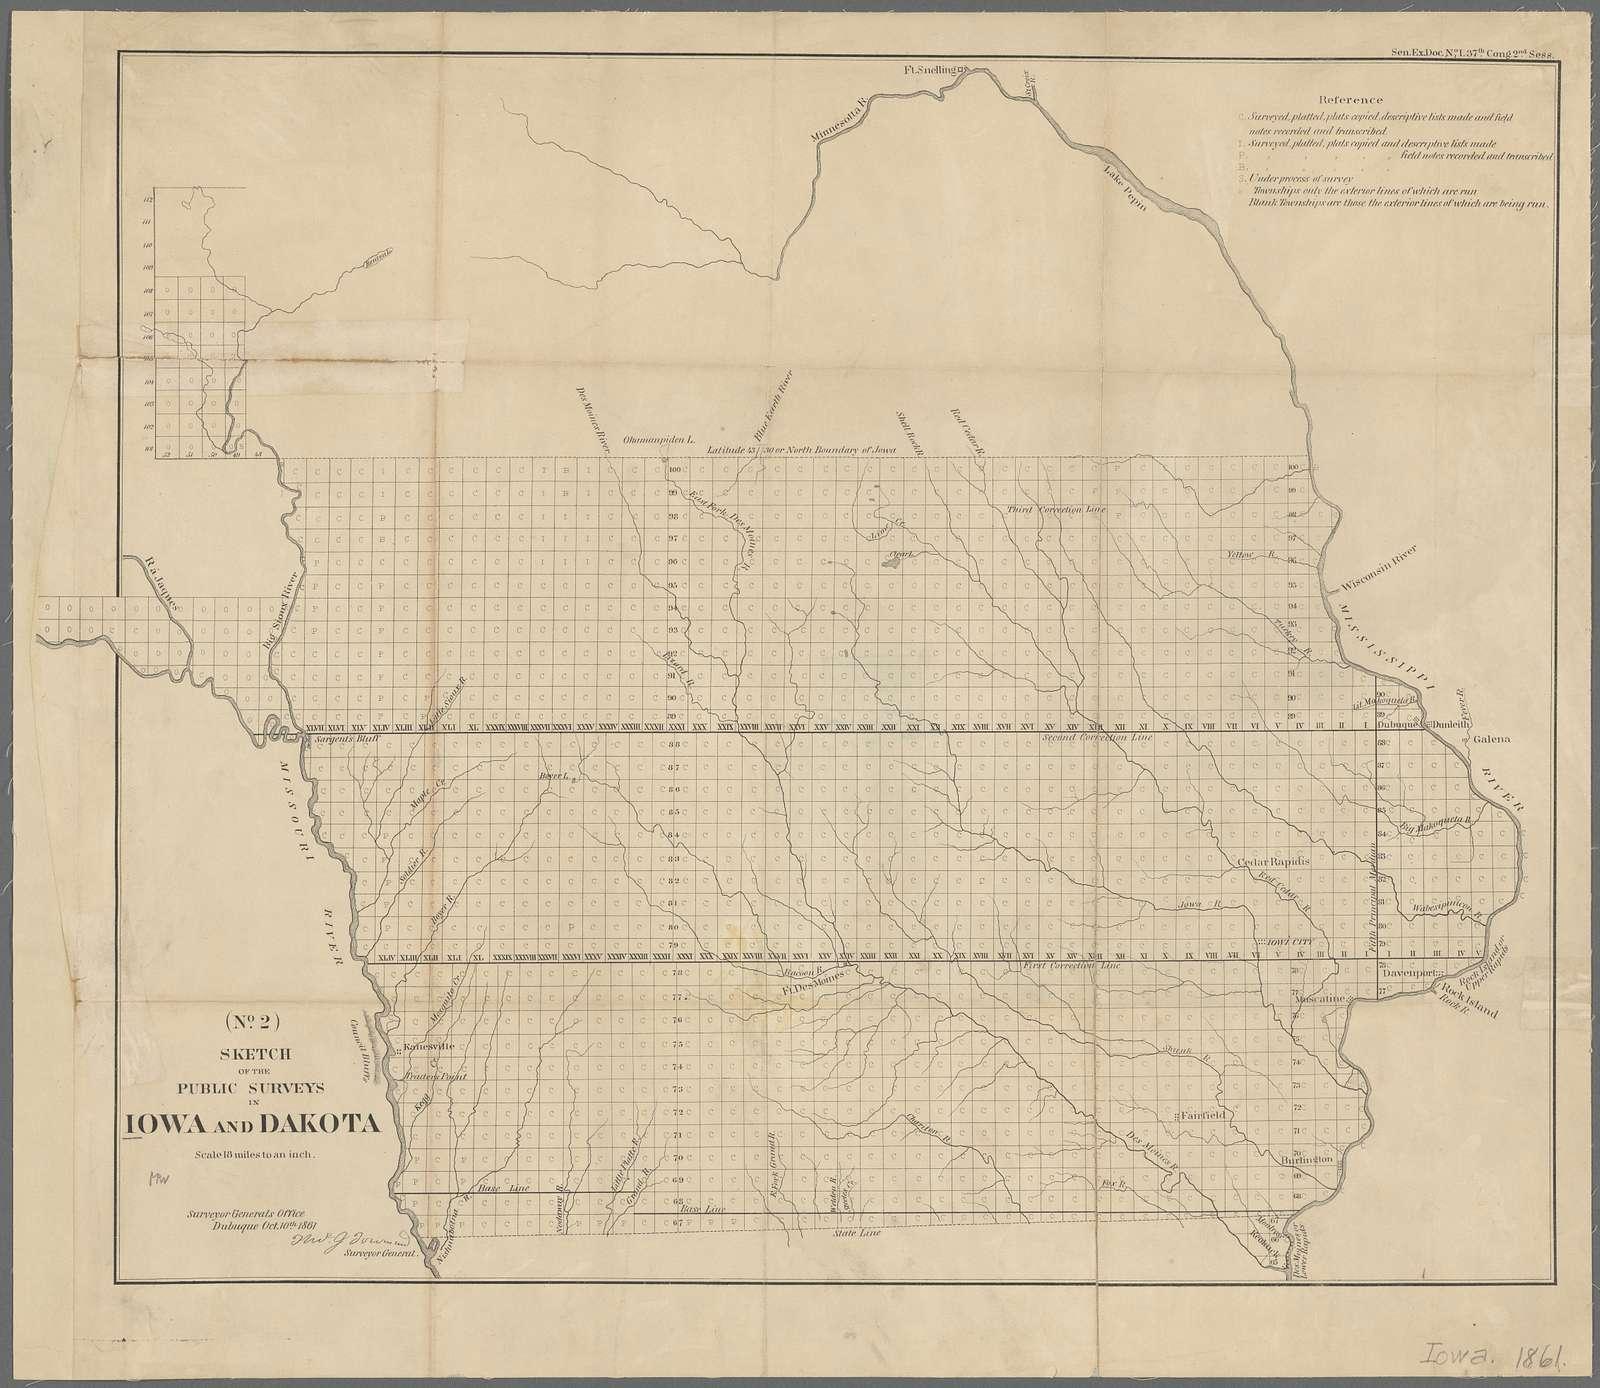 Sketch of the public surveys in Iowa and Dakota